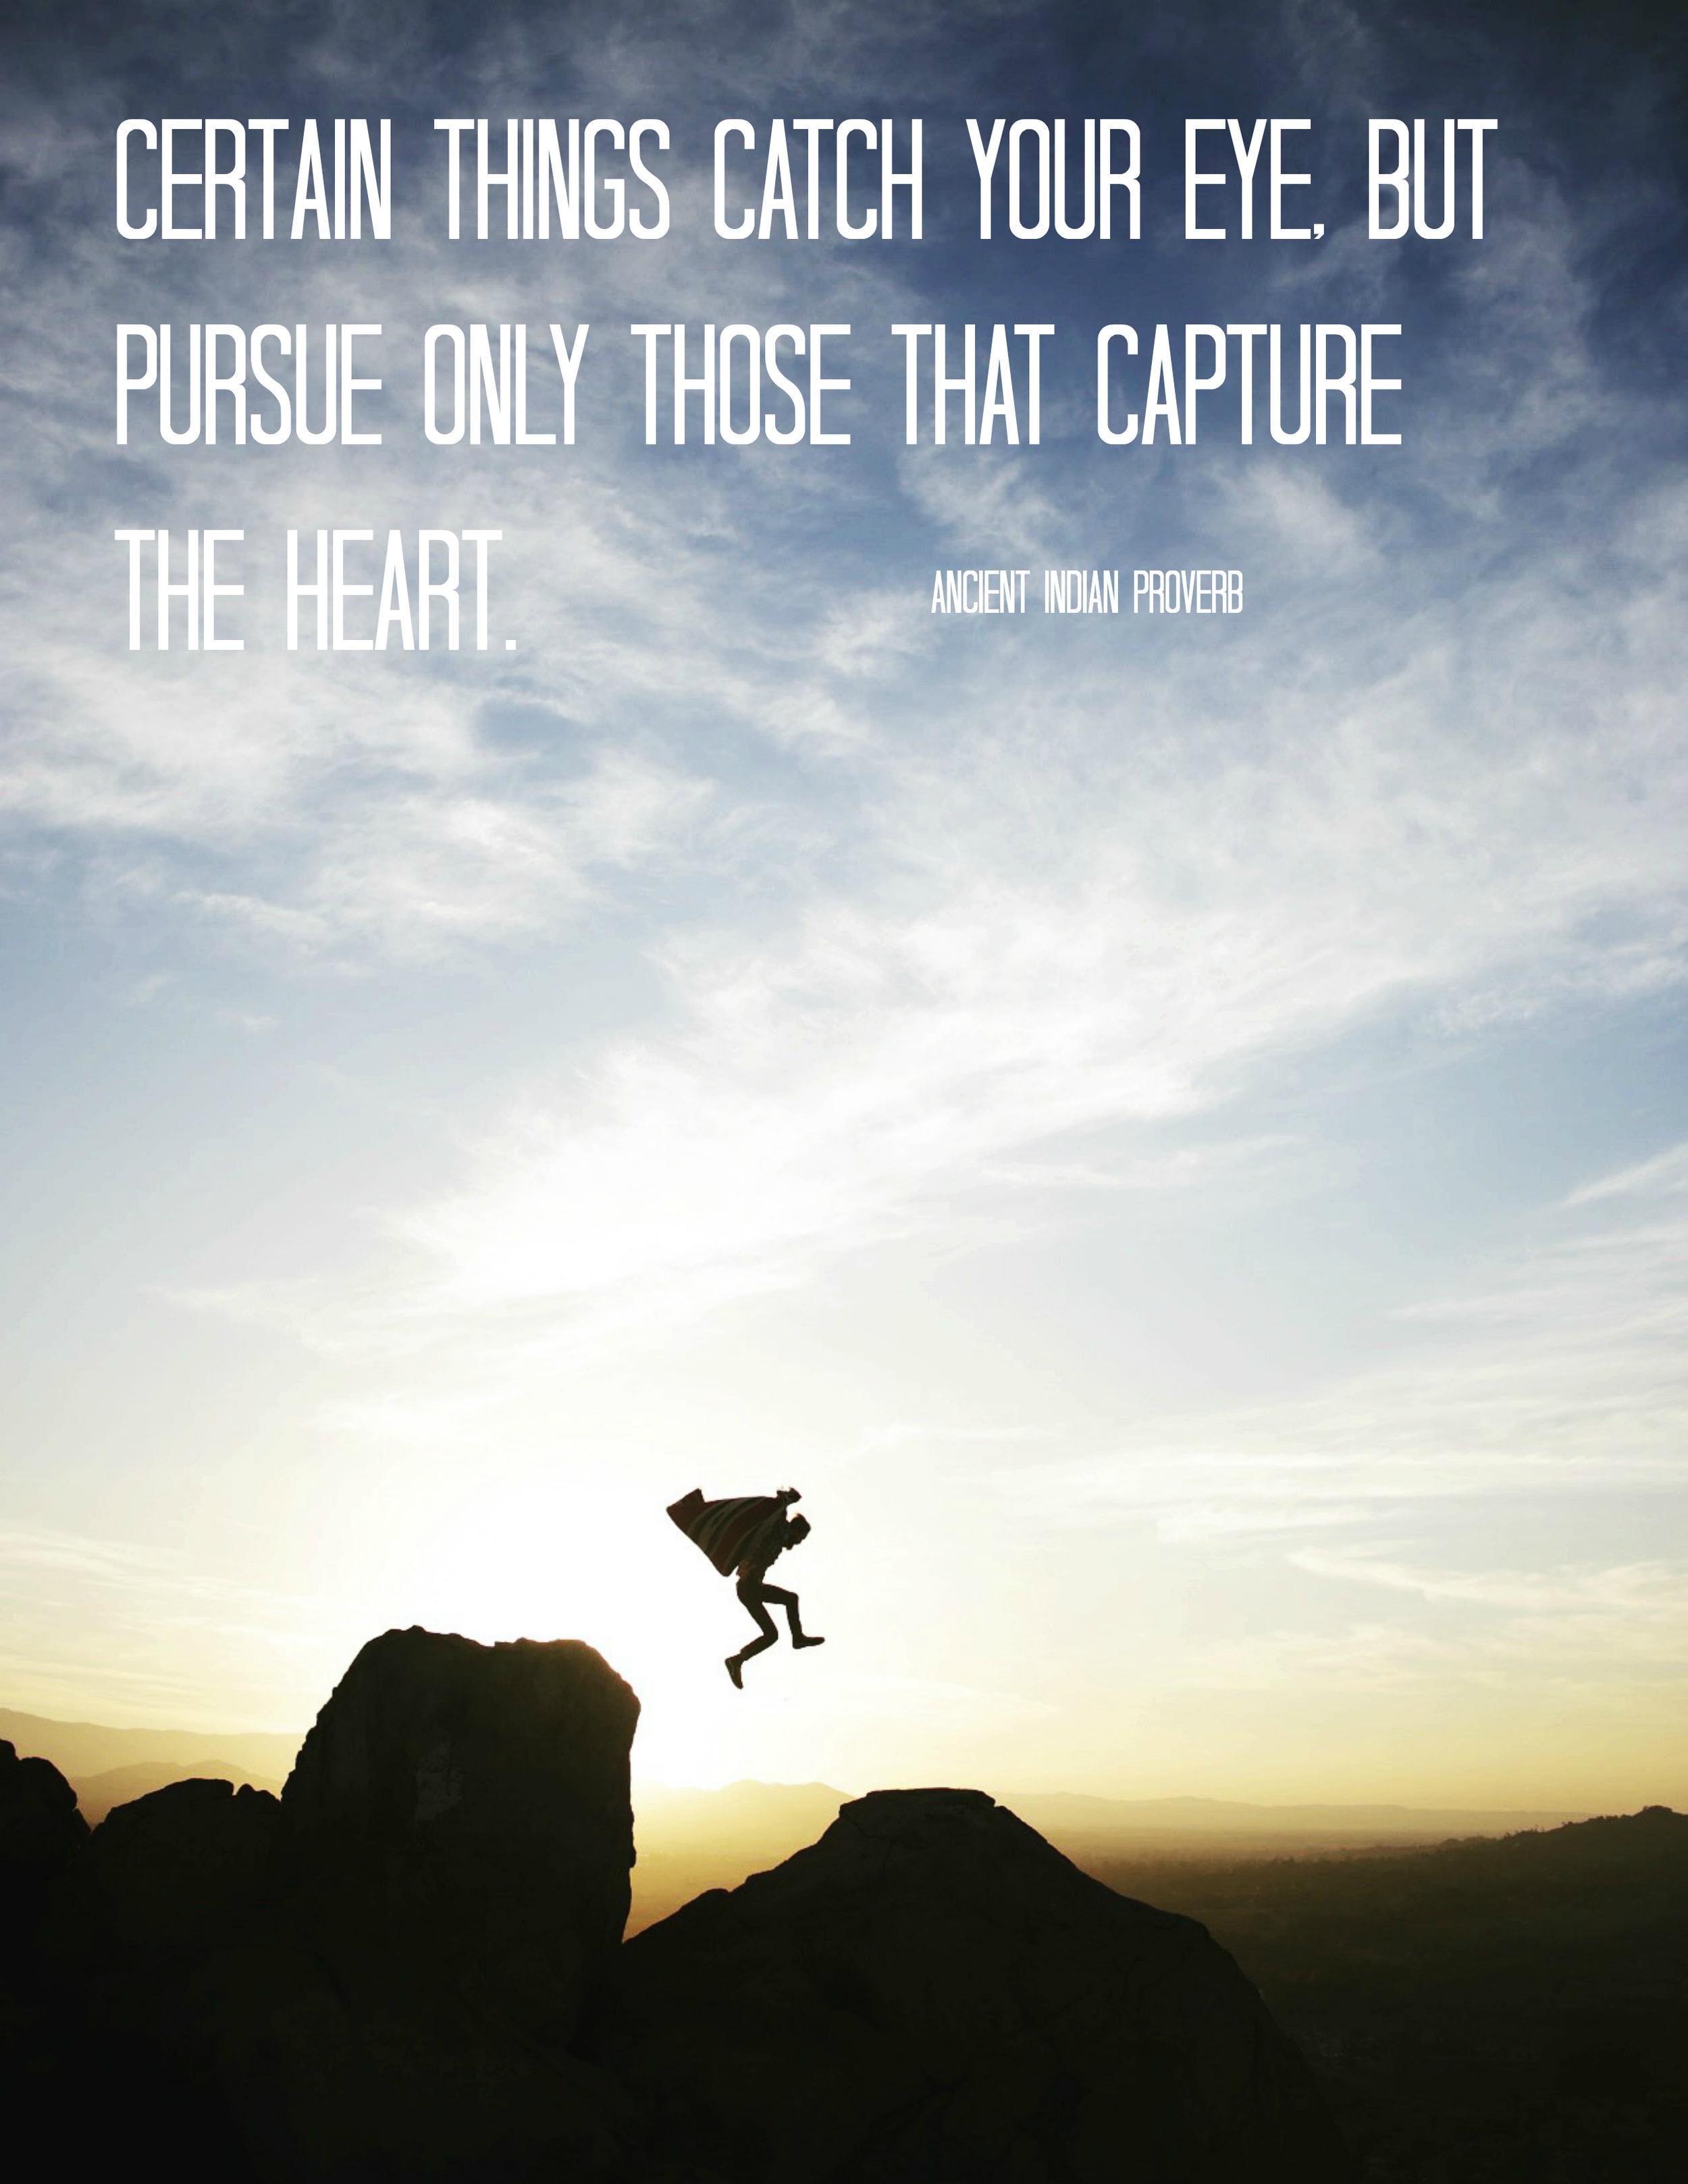 heart_proverb.jpg